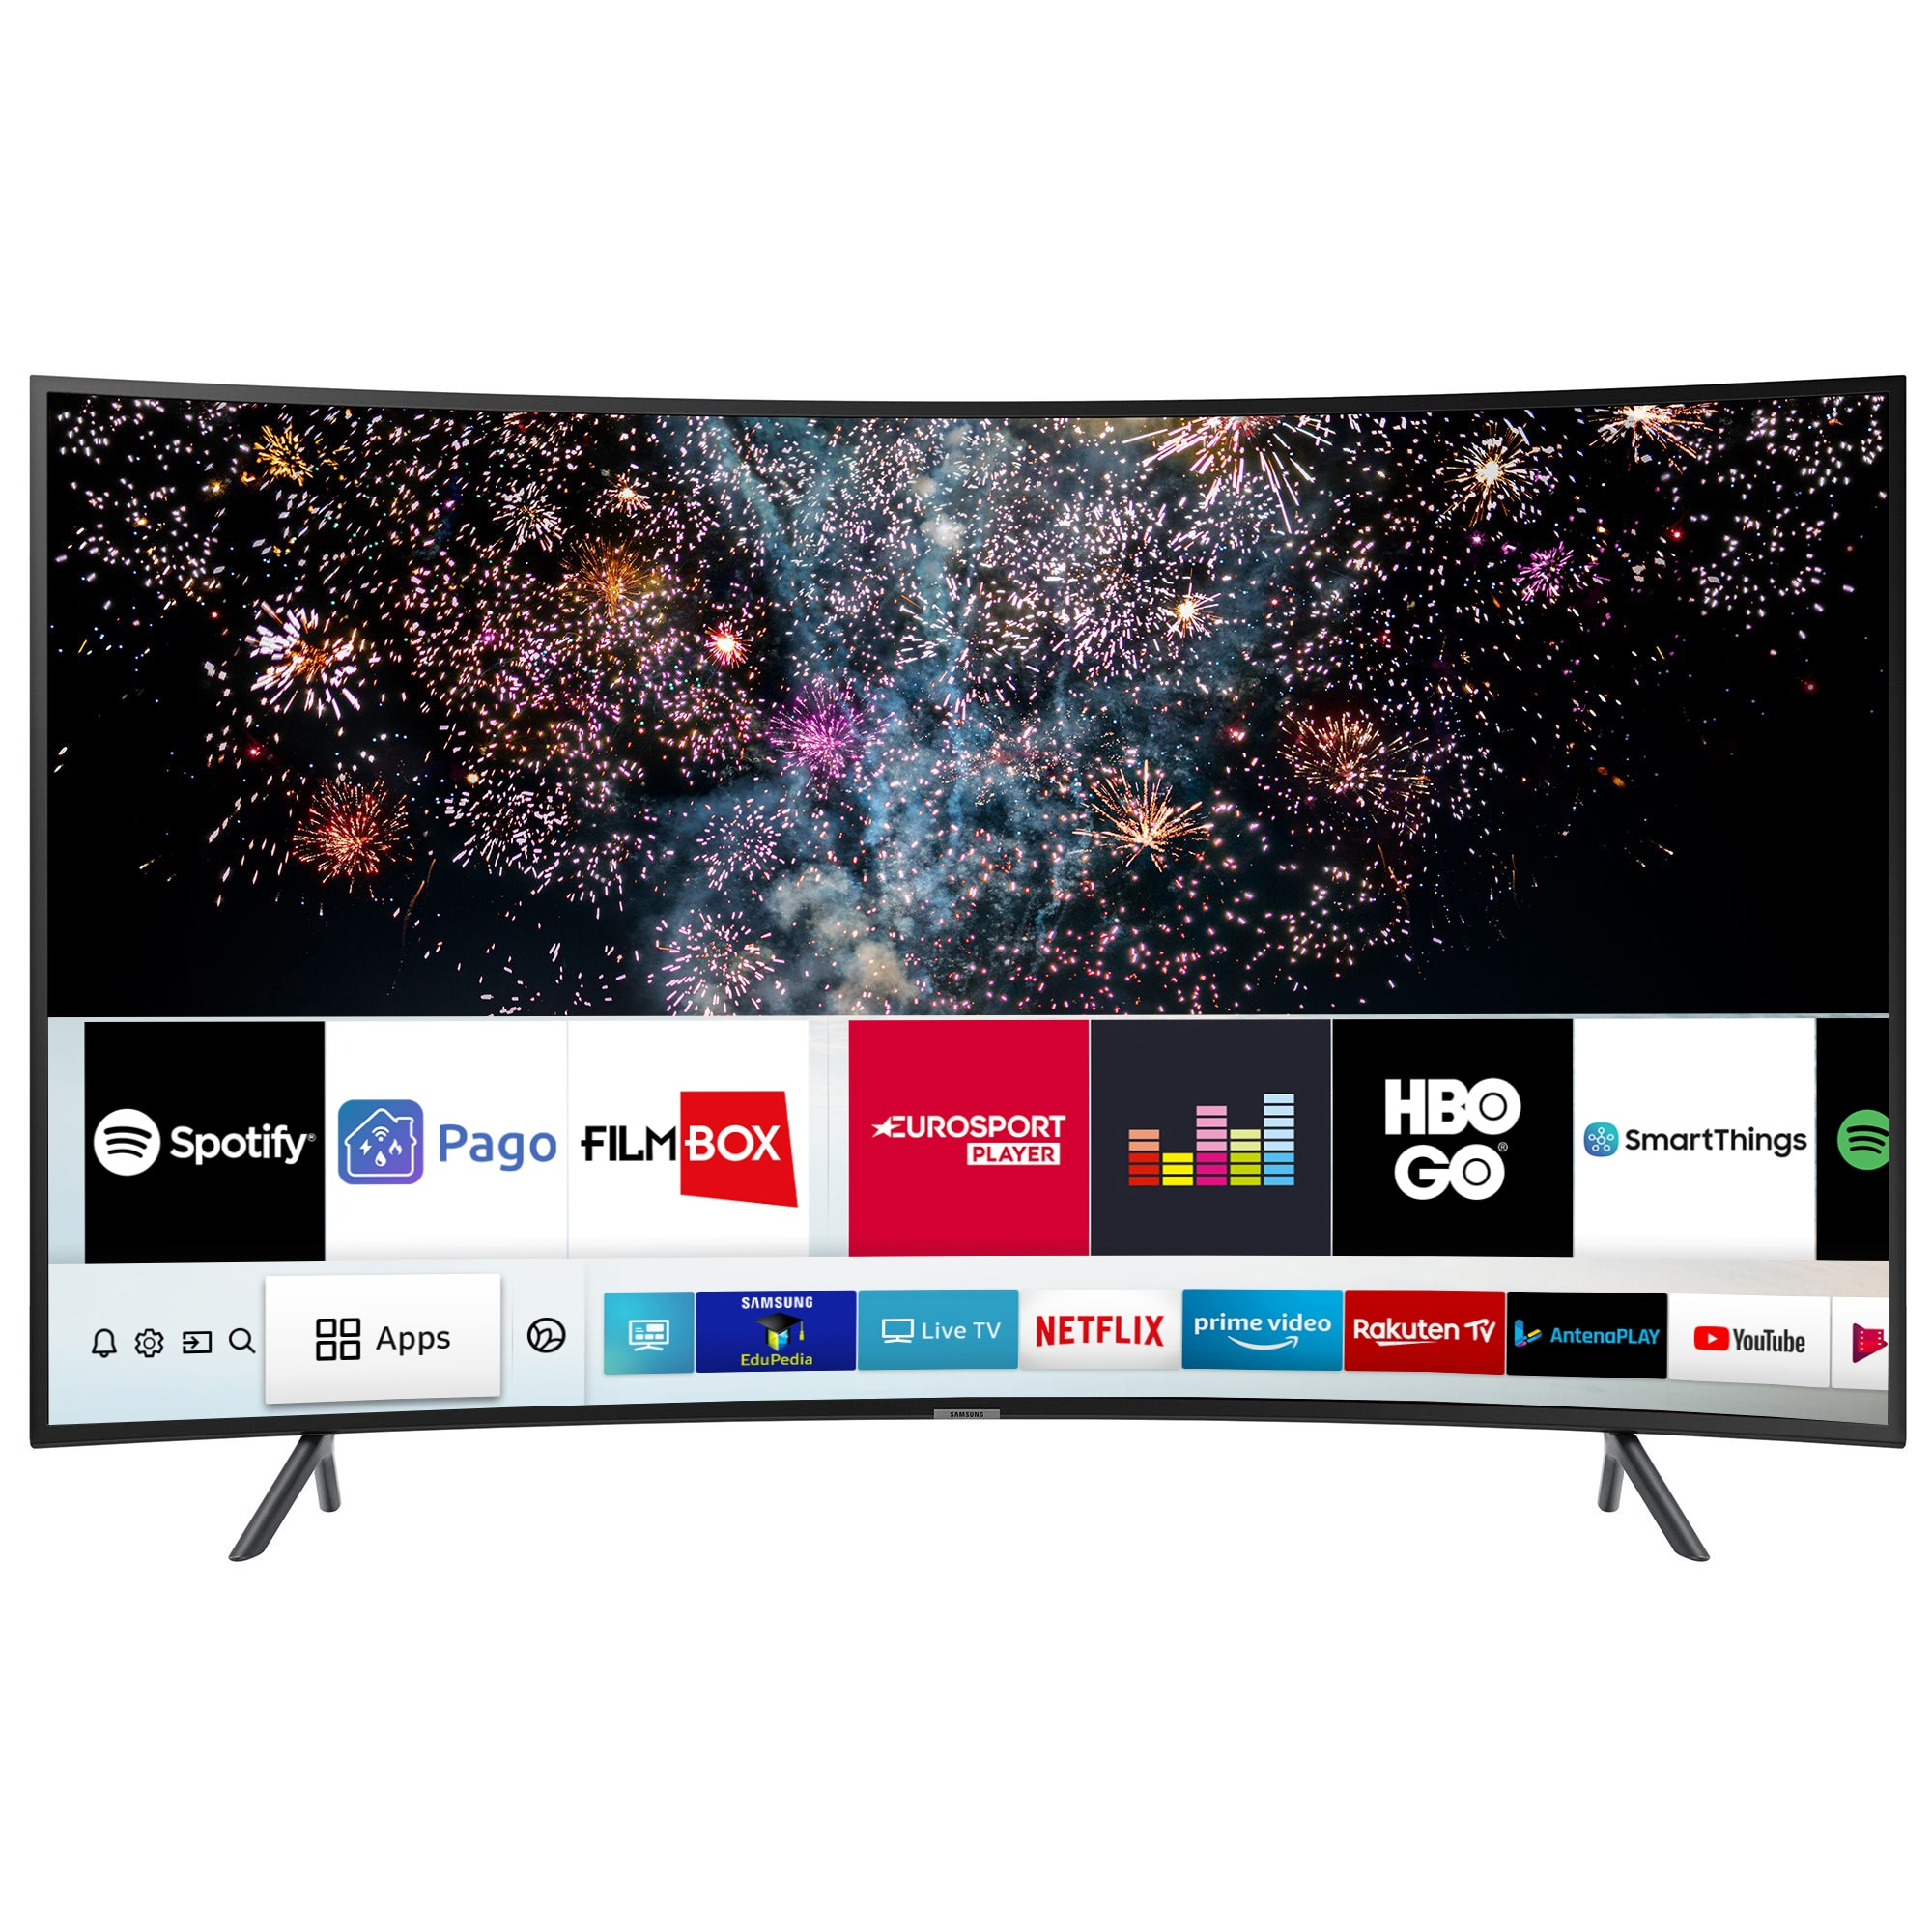 Fotografie Televizor LED curbat Smart Samsung, 138 cm, 55RU7302, 4K Ultra HD